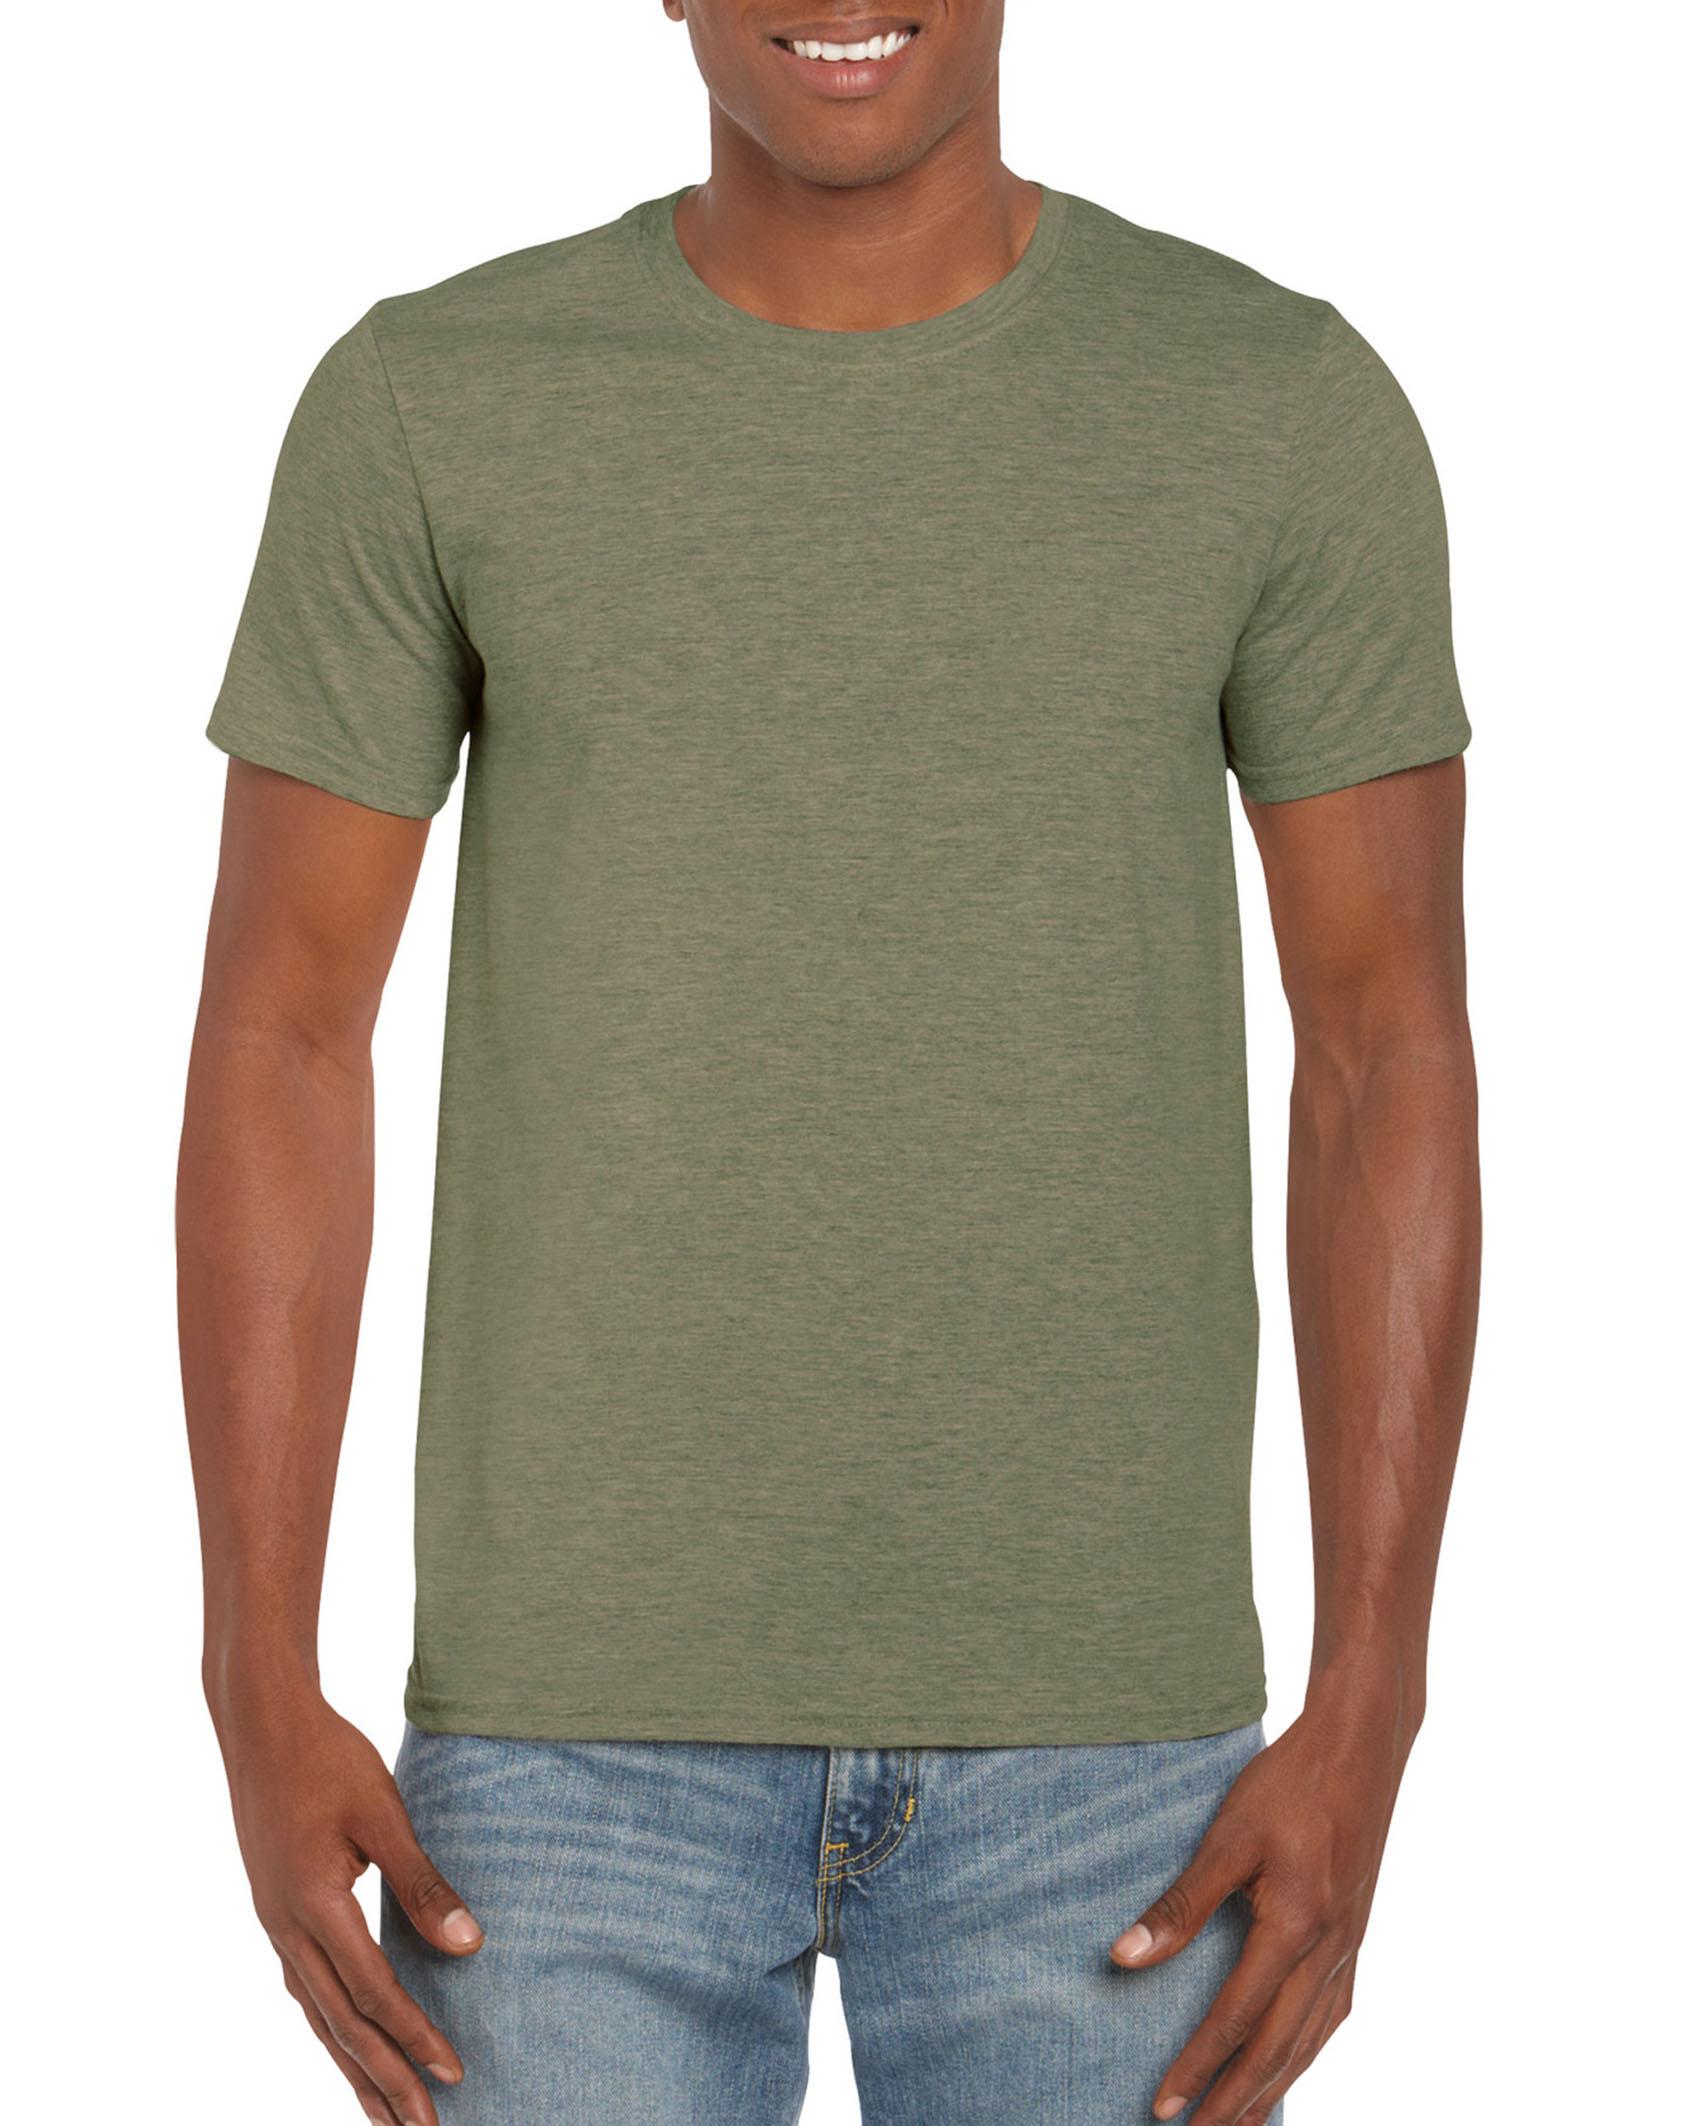 heather military green